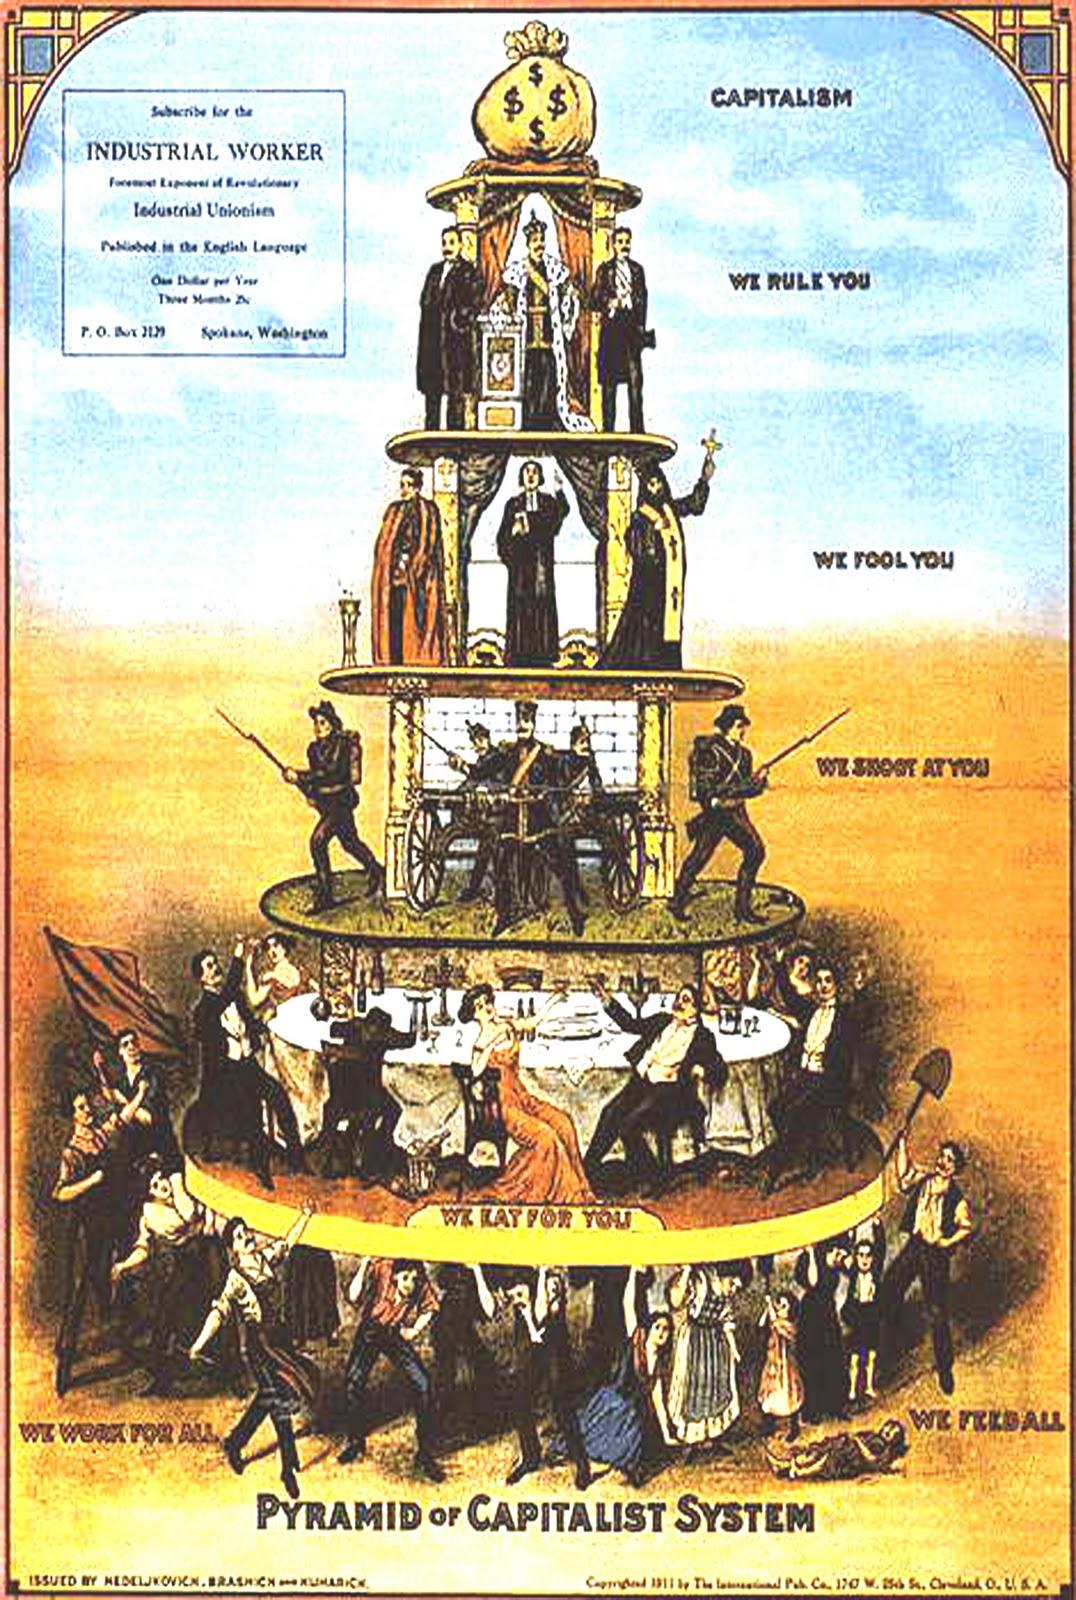 http://4.bp.blogspot.com/_0VgP3aUVGrw/TT1BbhL4FLI/AAAAAAAAAF4/egG0QRhWERA/s1600/Pyramid+of+Capitalism.jpg